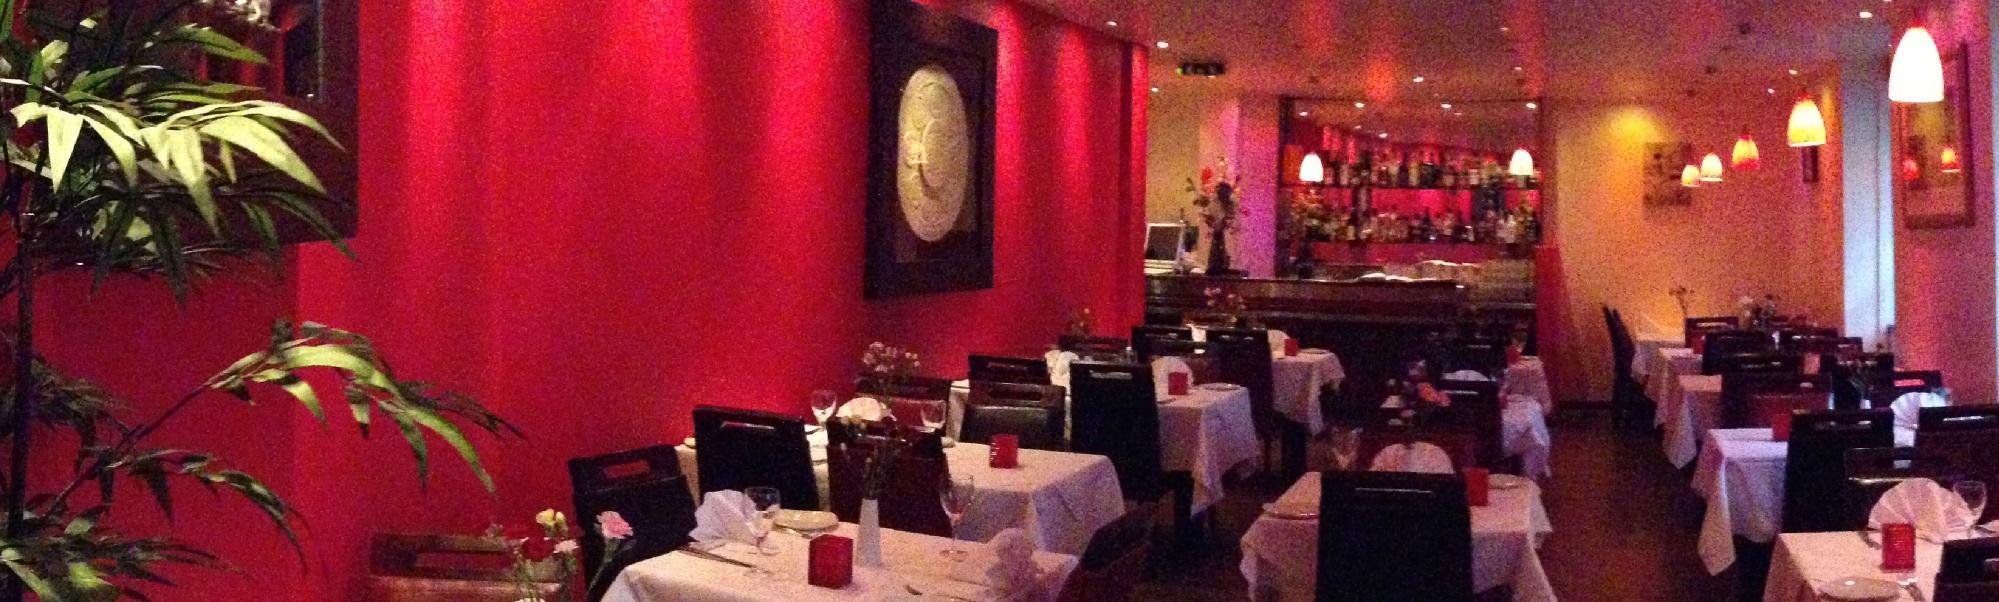 The 10 Best Restaurants Near The Aberdeen Altens Hotel